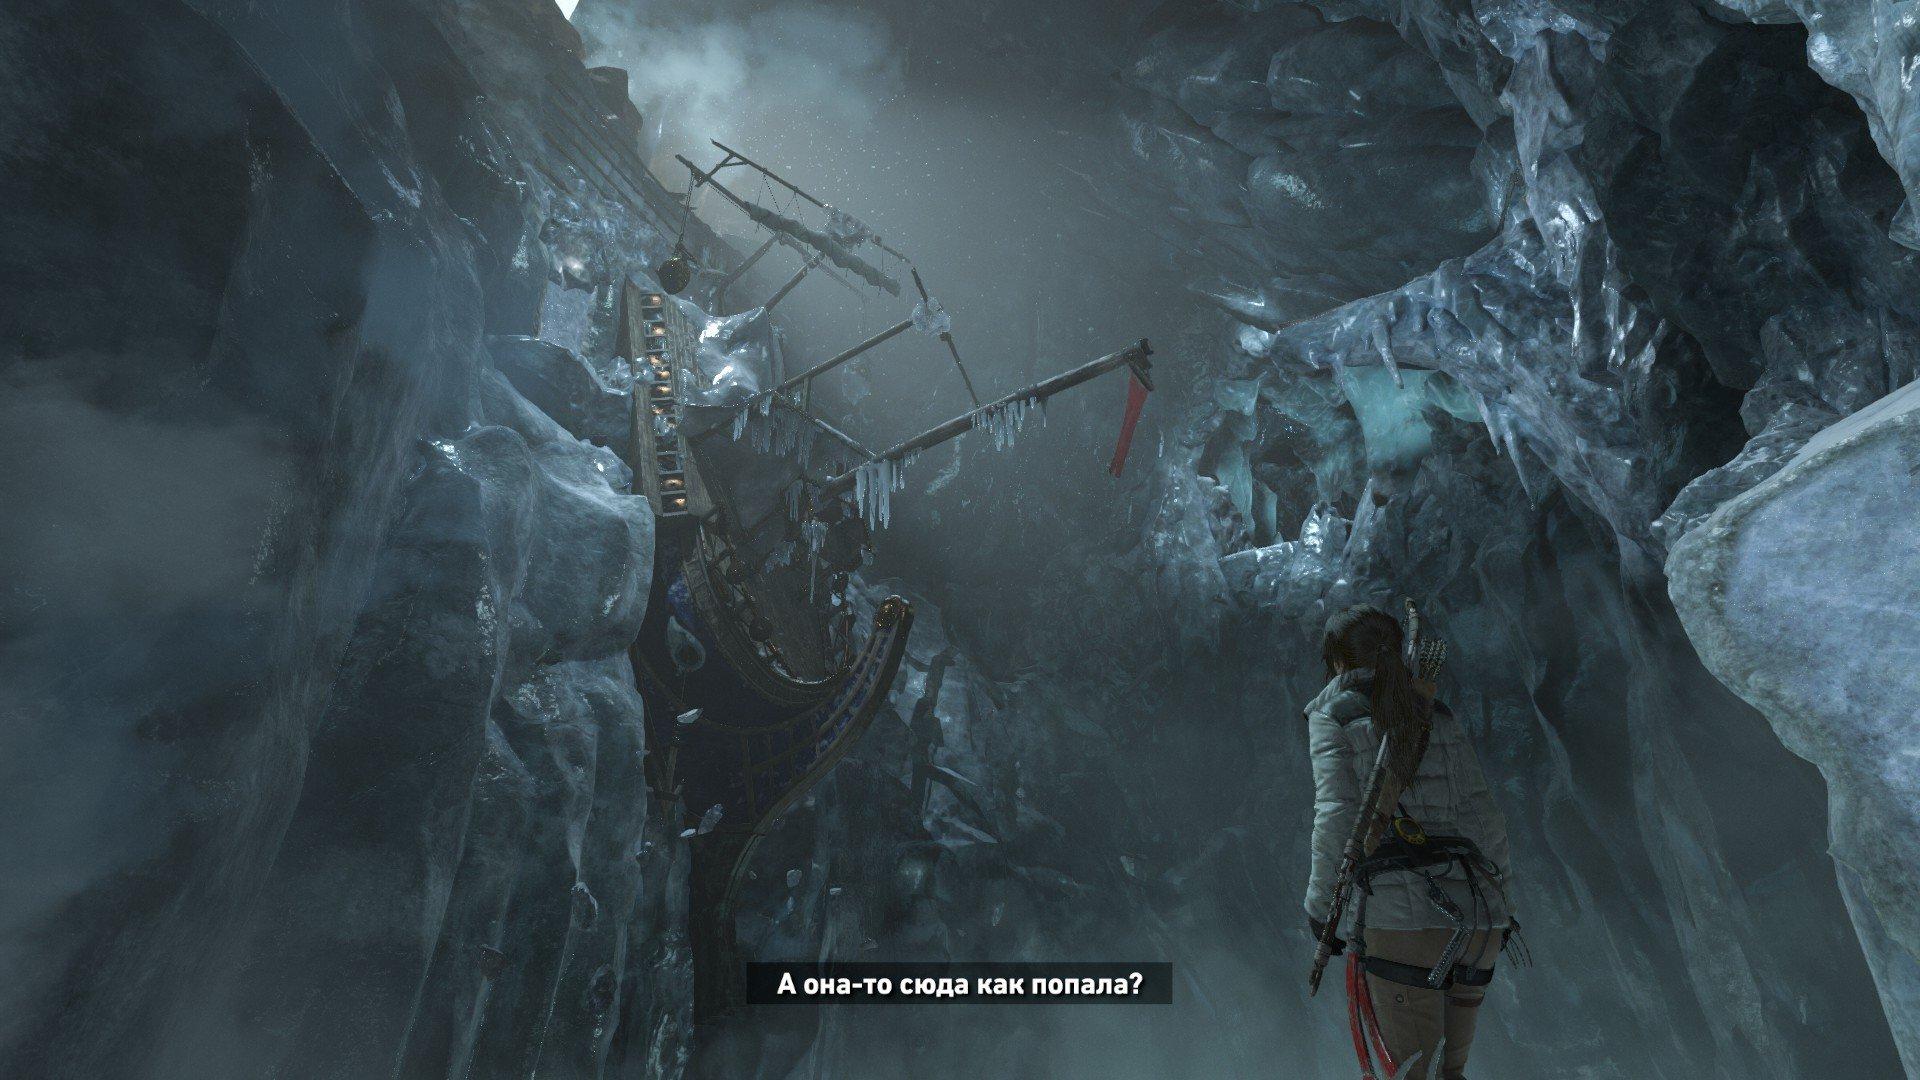 Rise of the Tomb Raider или да когда же этот медведь сдохнет?. - Изображение 35